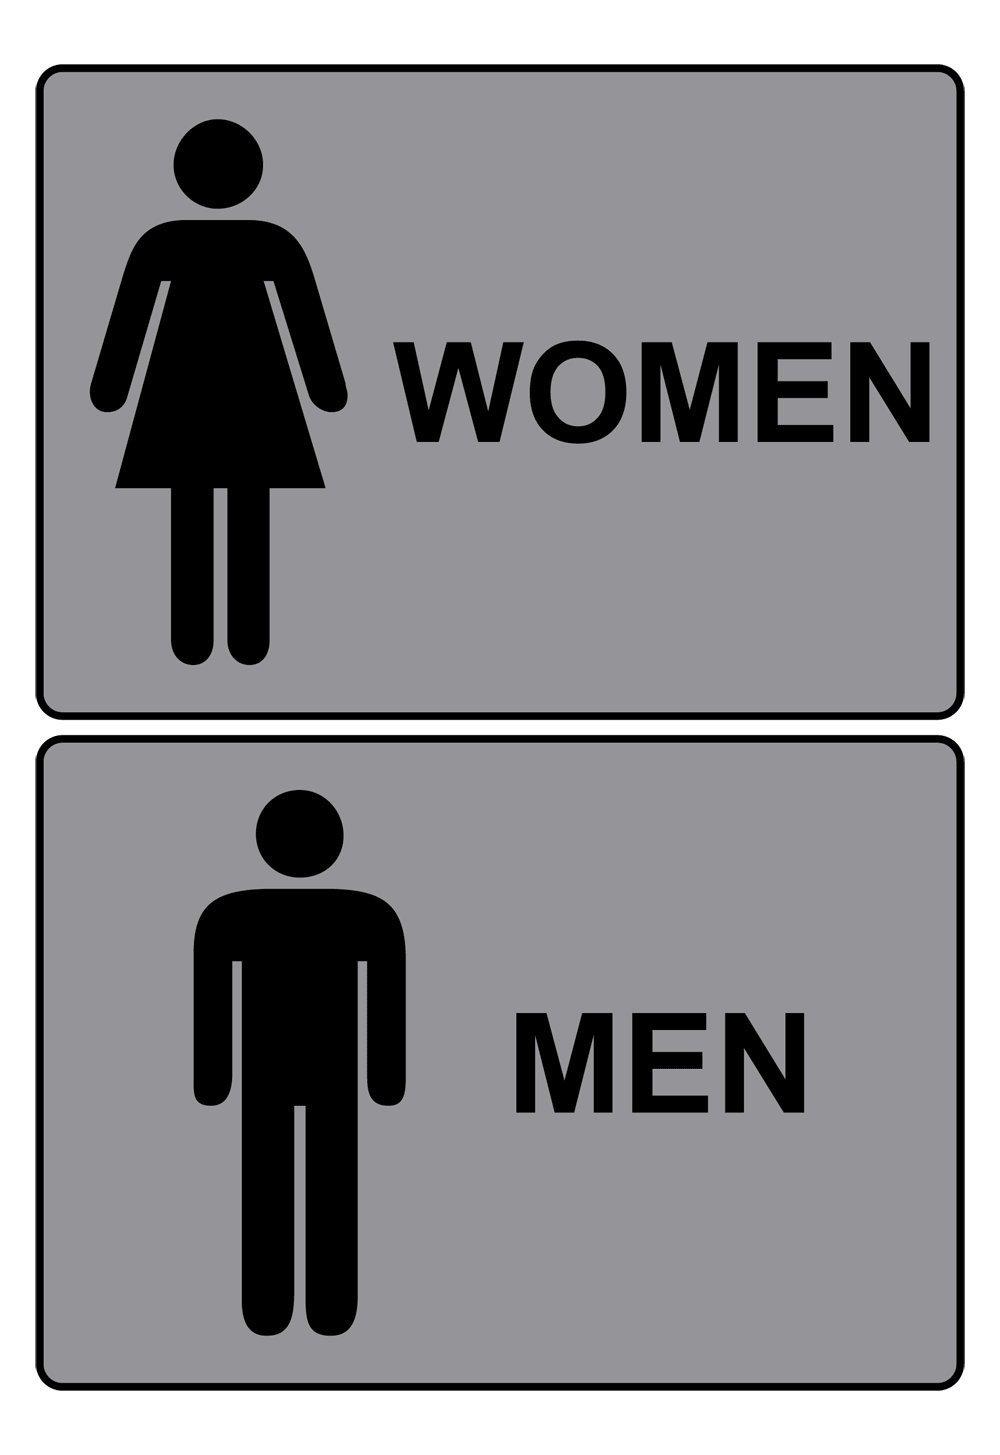 ComplianceSigns Men / Women Aluminum Restroom Signs Set, 10 x 7 with English, Gray